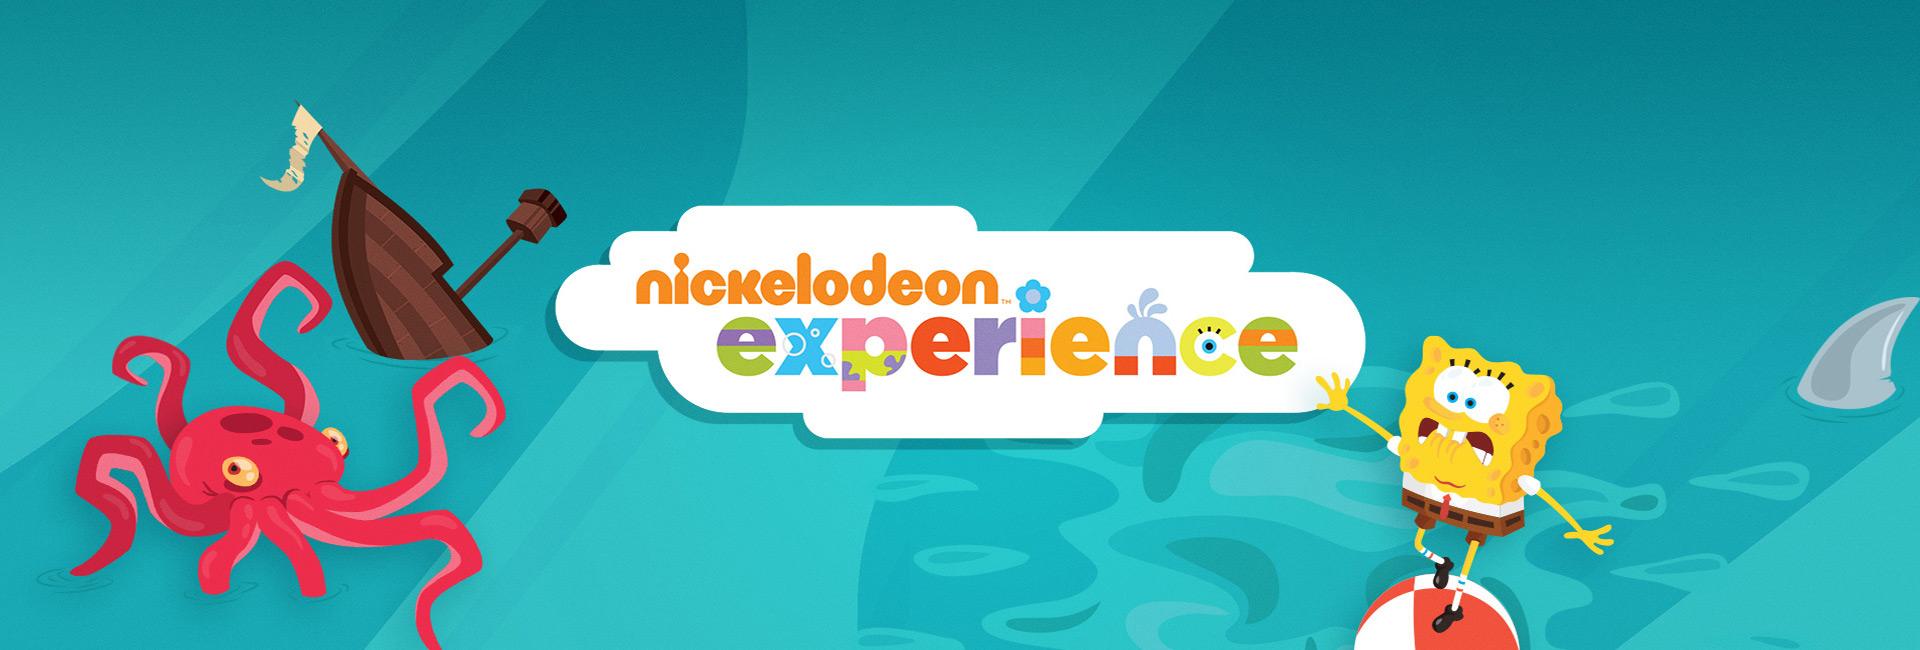 Nickelodeon Experience